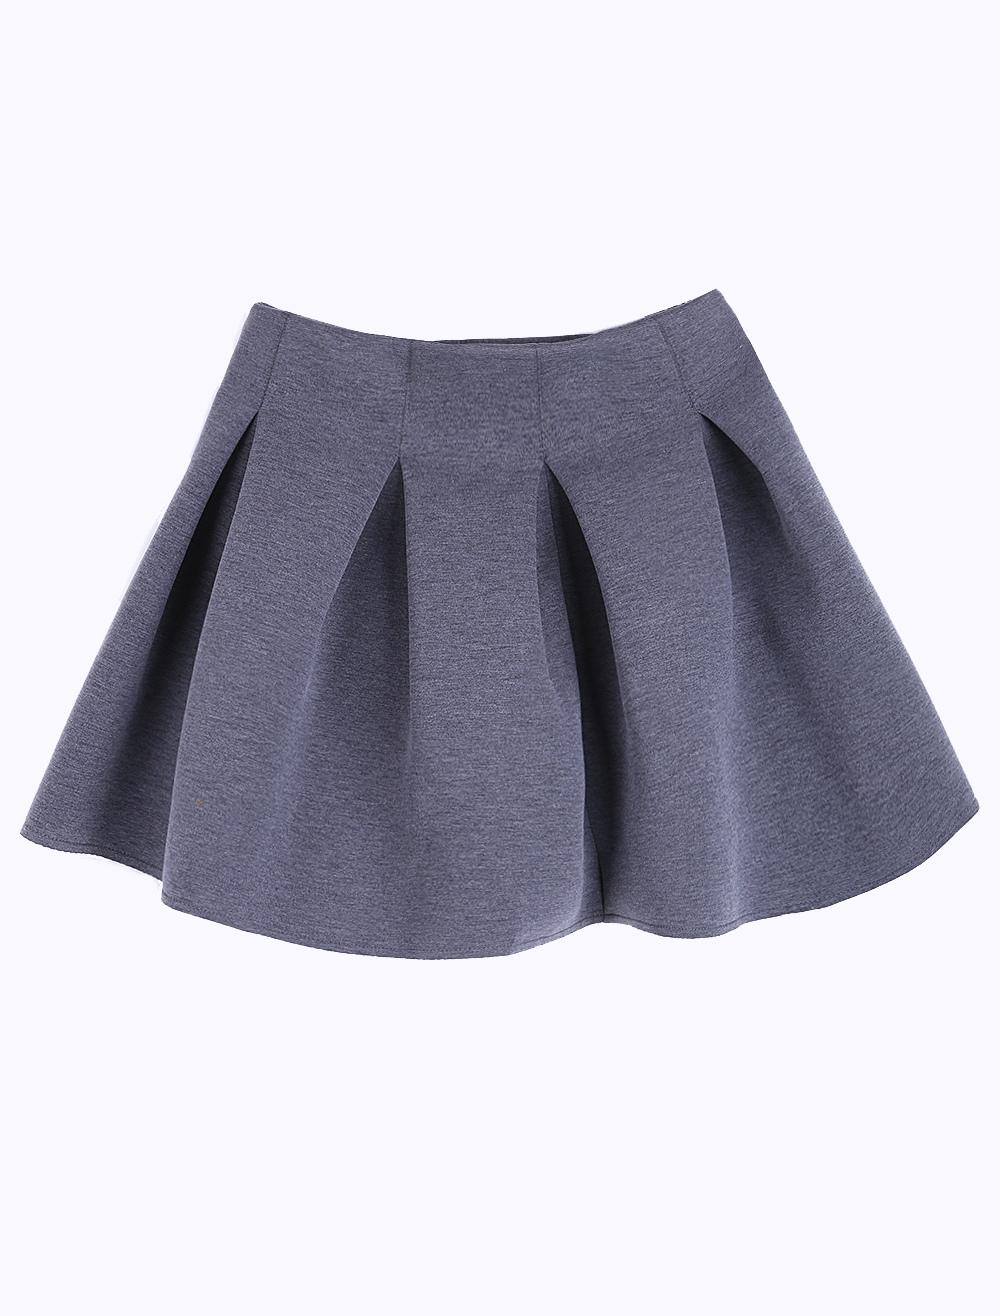 Gray High-waisted Pleated & Flared Skirt - Milanoo.com